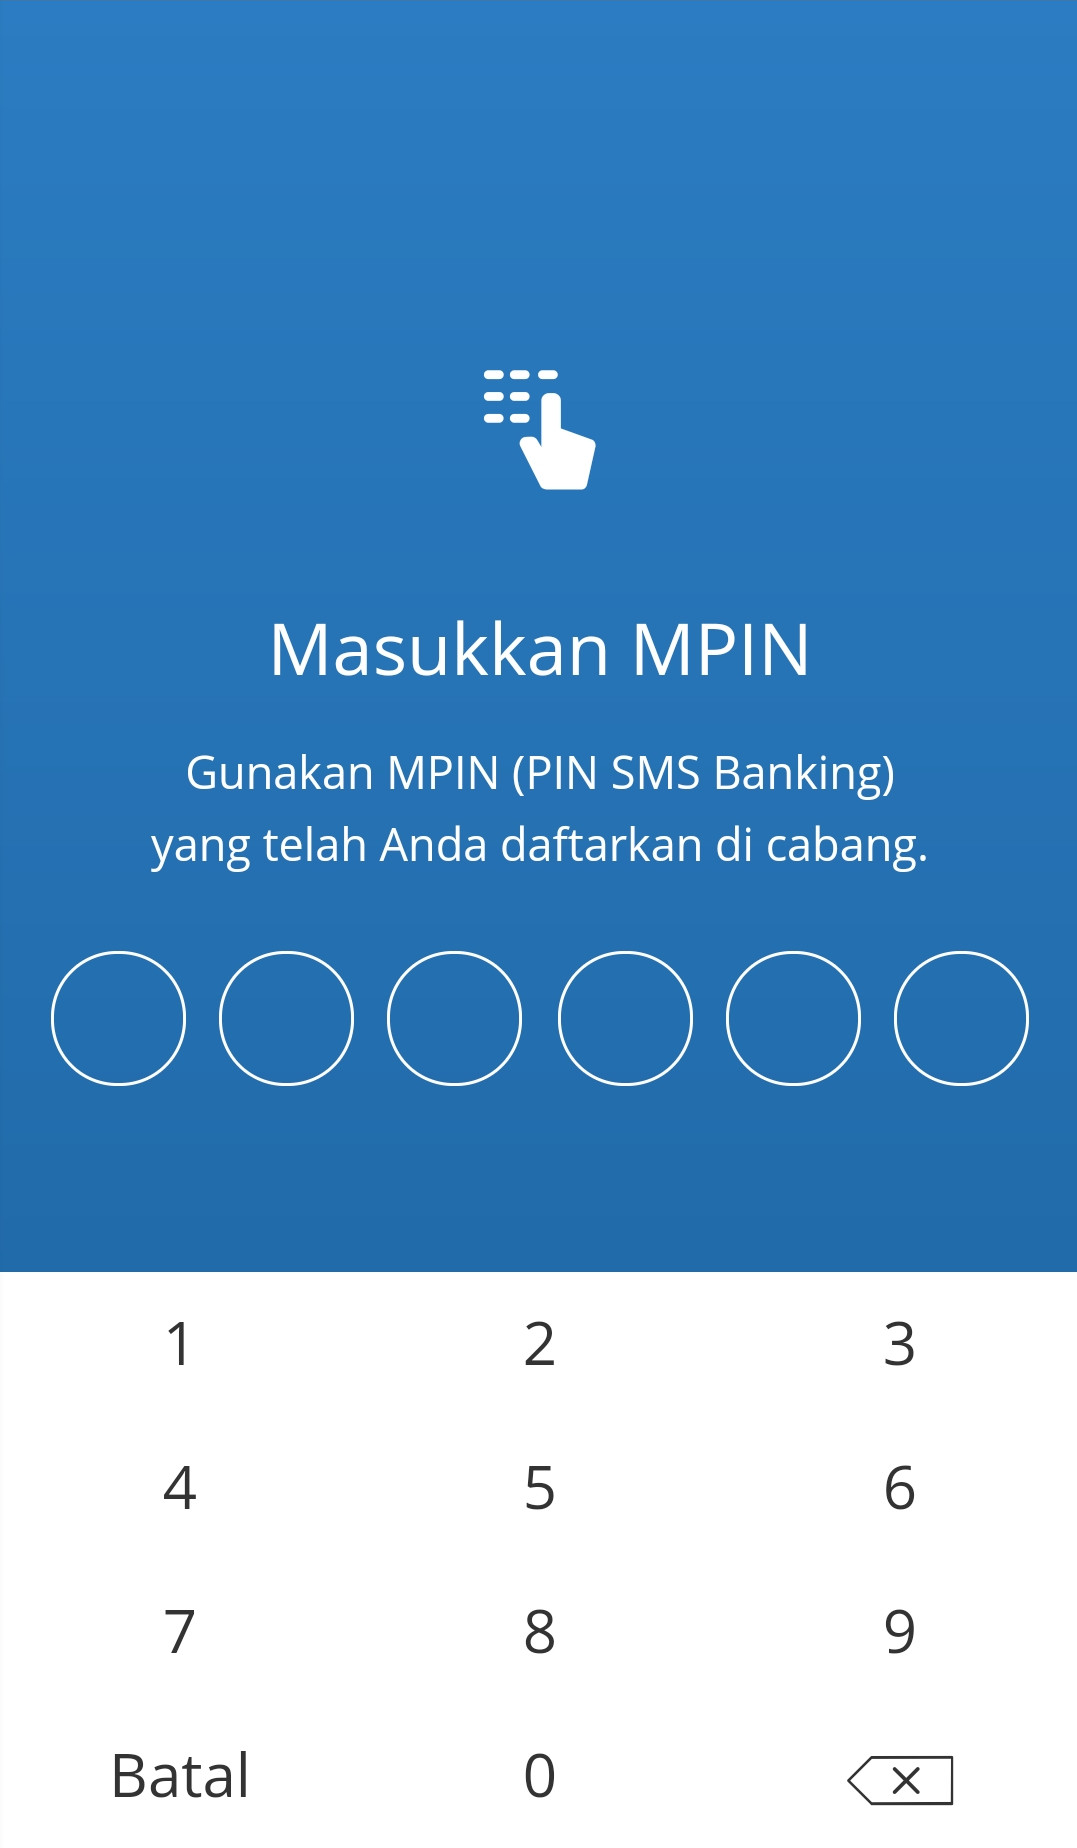 mpin bank mandiri